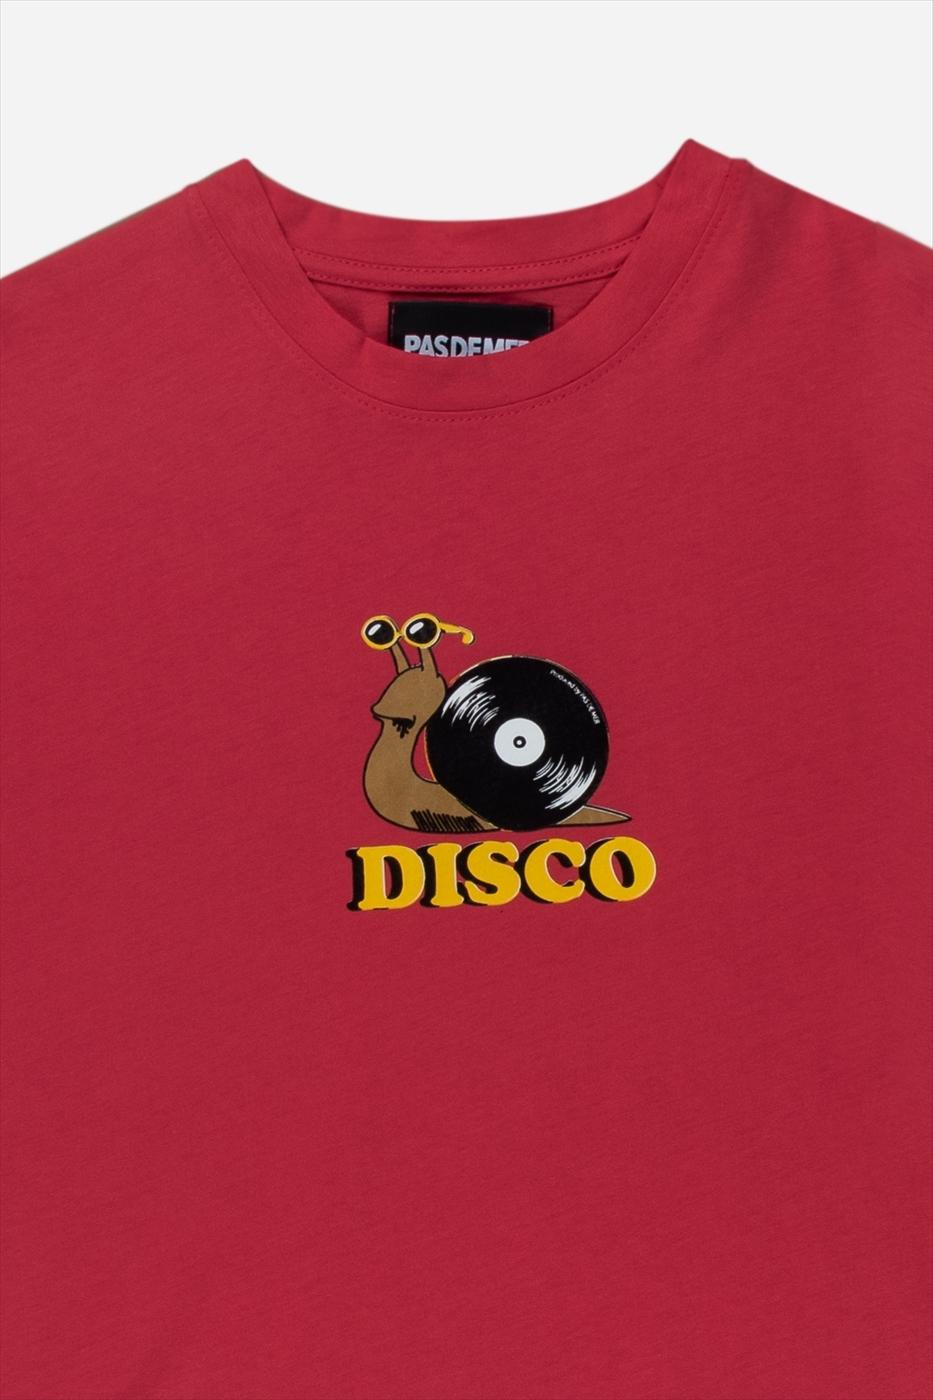 【PAS DE MER/パドゥメ】DISCO T-SHIRT Tシャツ / RED SALMON